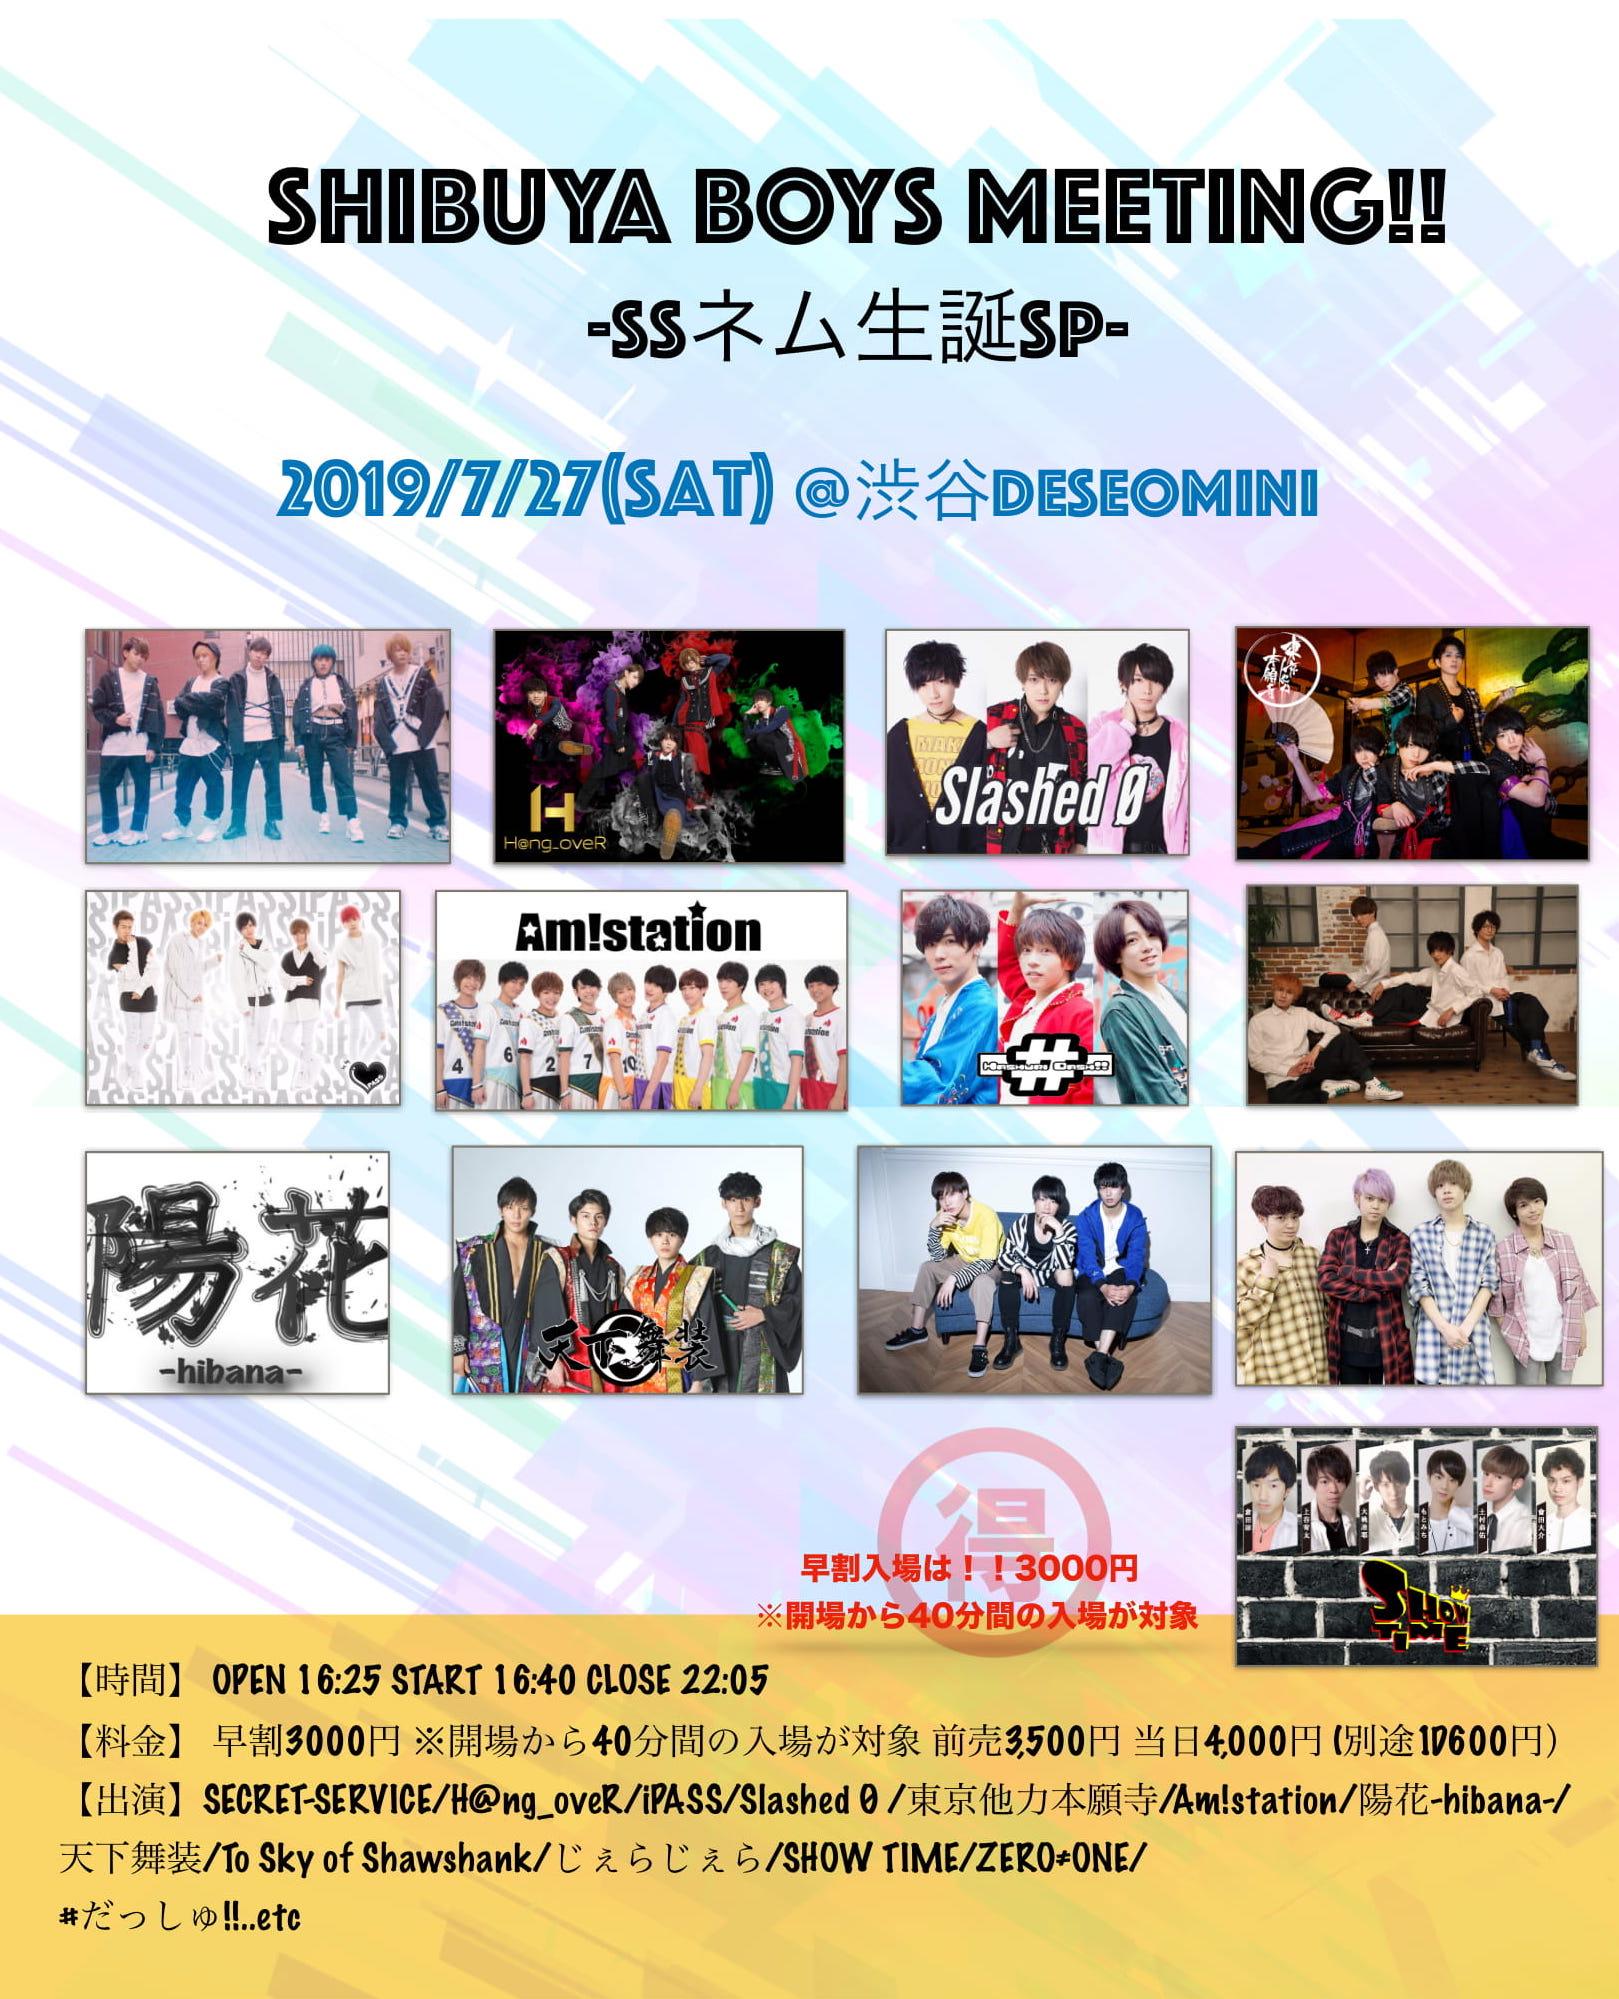 『SHIBUYA BOYS MEETING!!- SSネム生誕祭SP-』